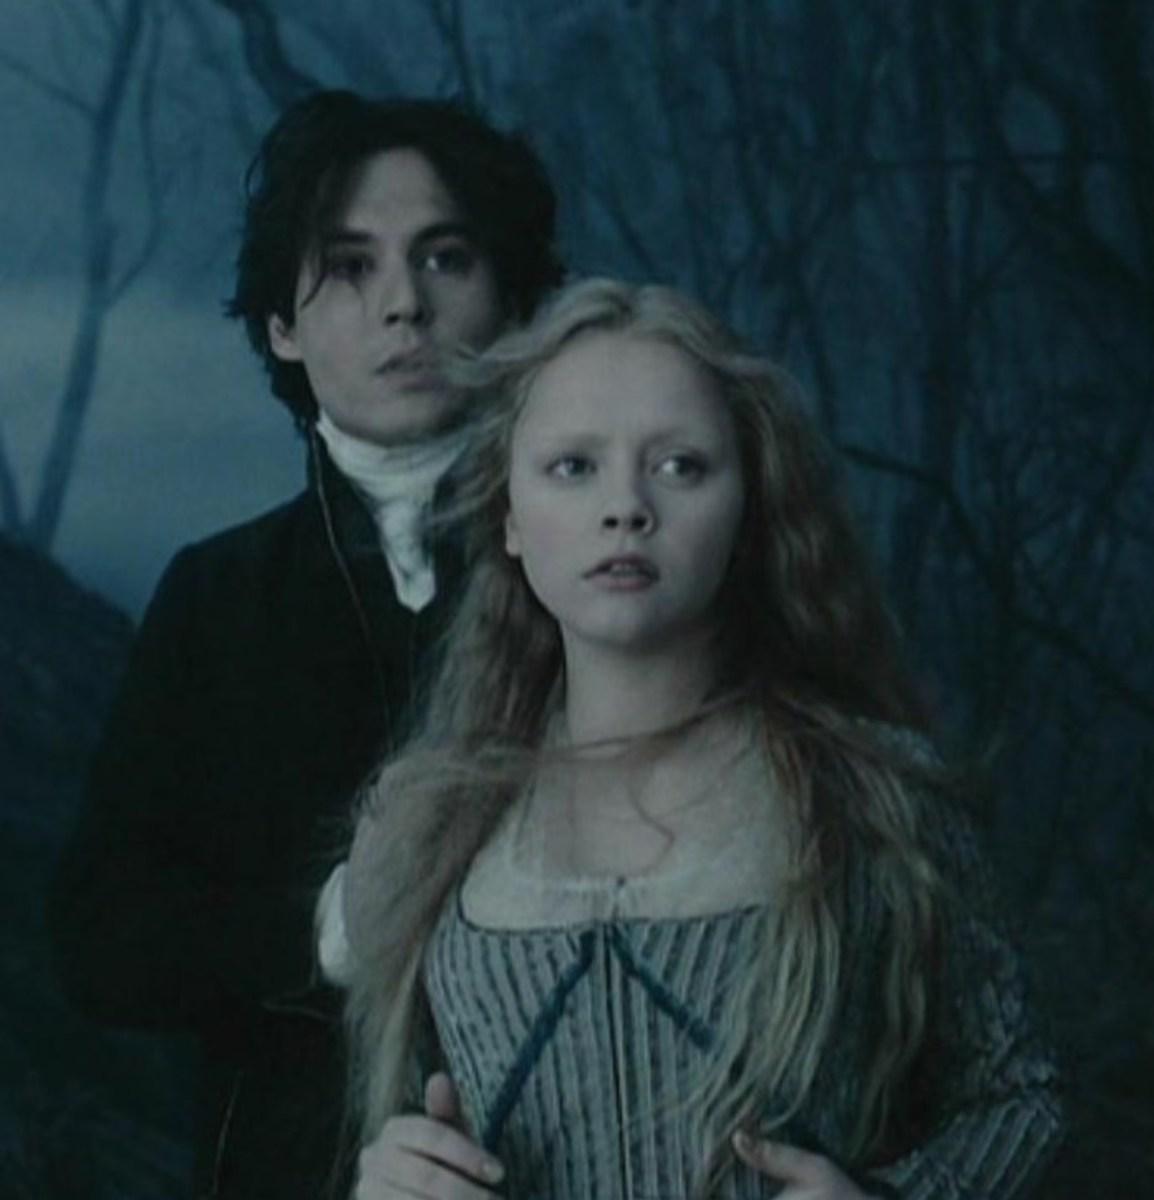 Johnny Depp and Christina Ricci in Sleepy Hollow (1999)